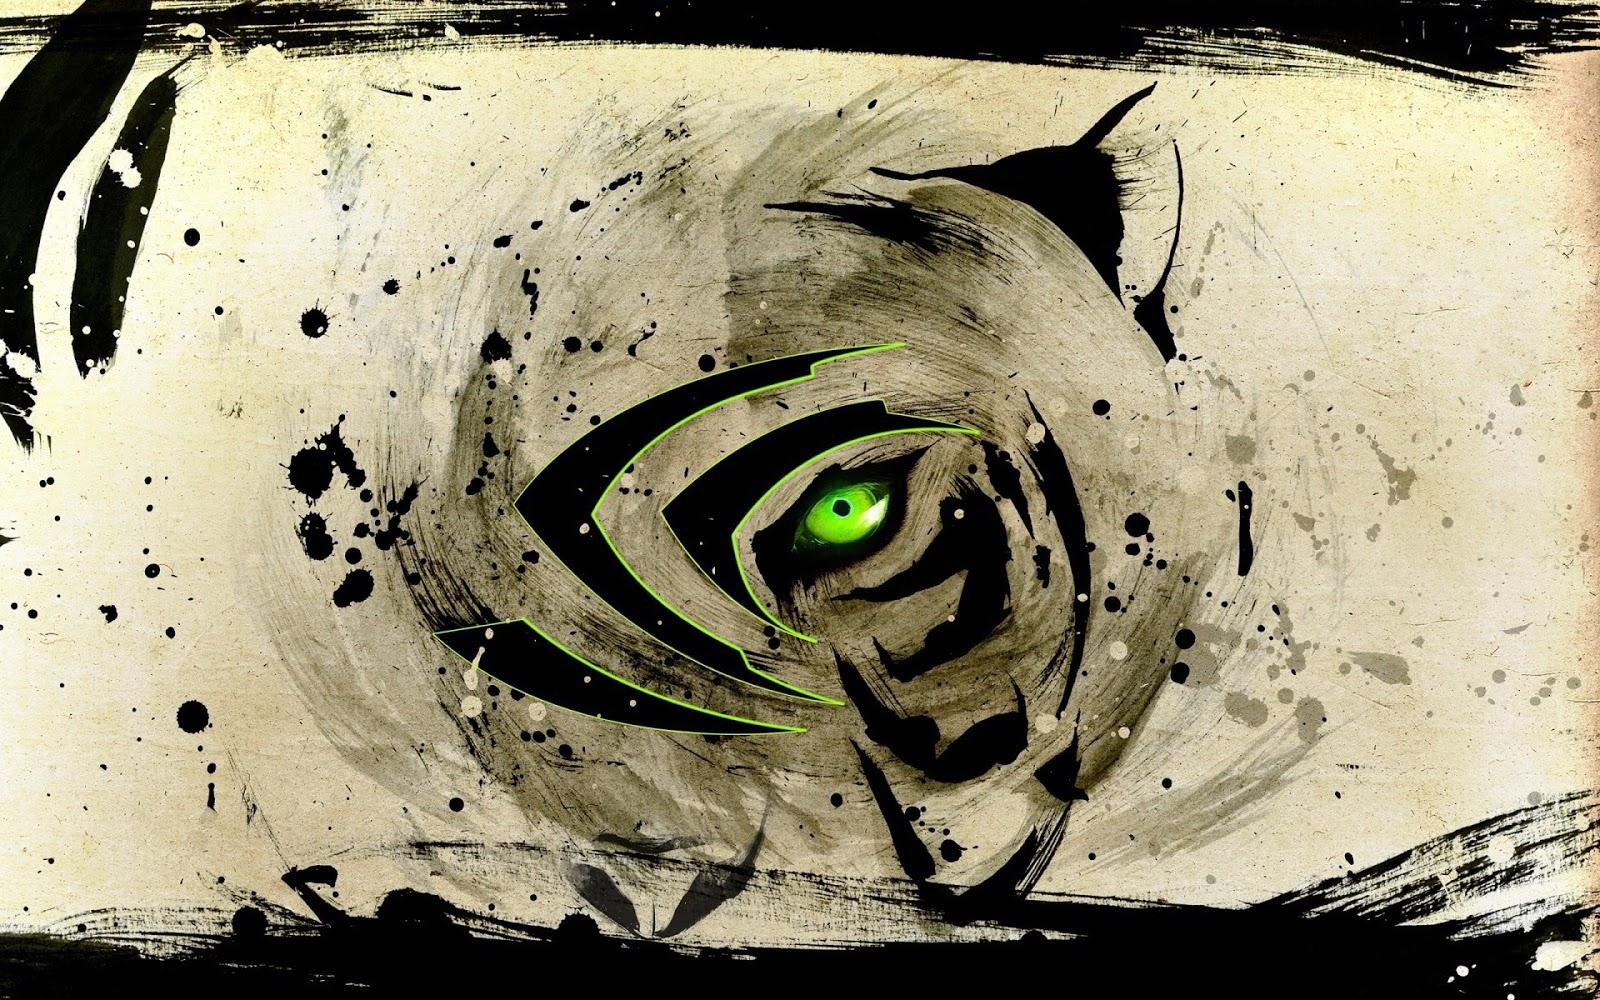 Fantasy Wildlife Abstract Animal Creative Design Art HD Wallpaper